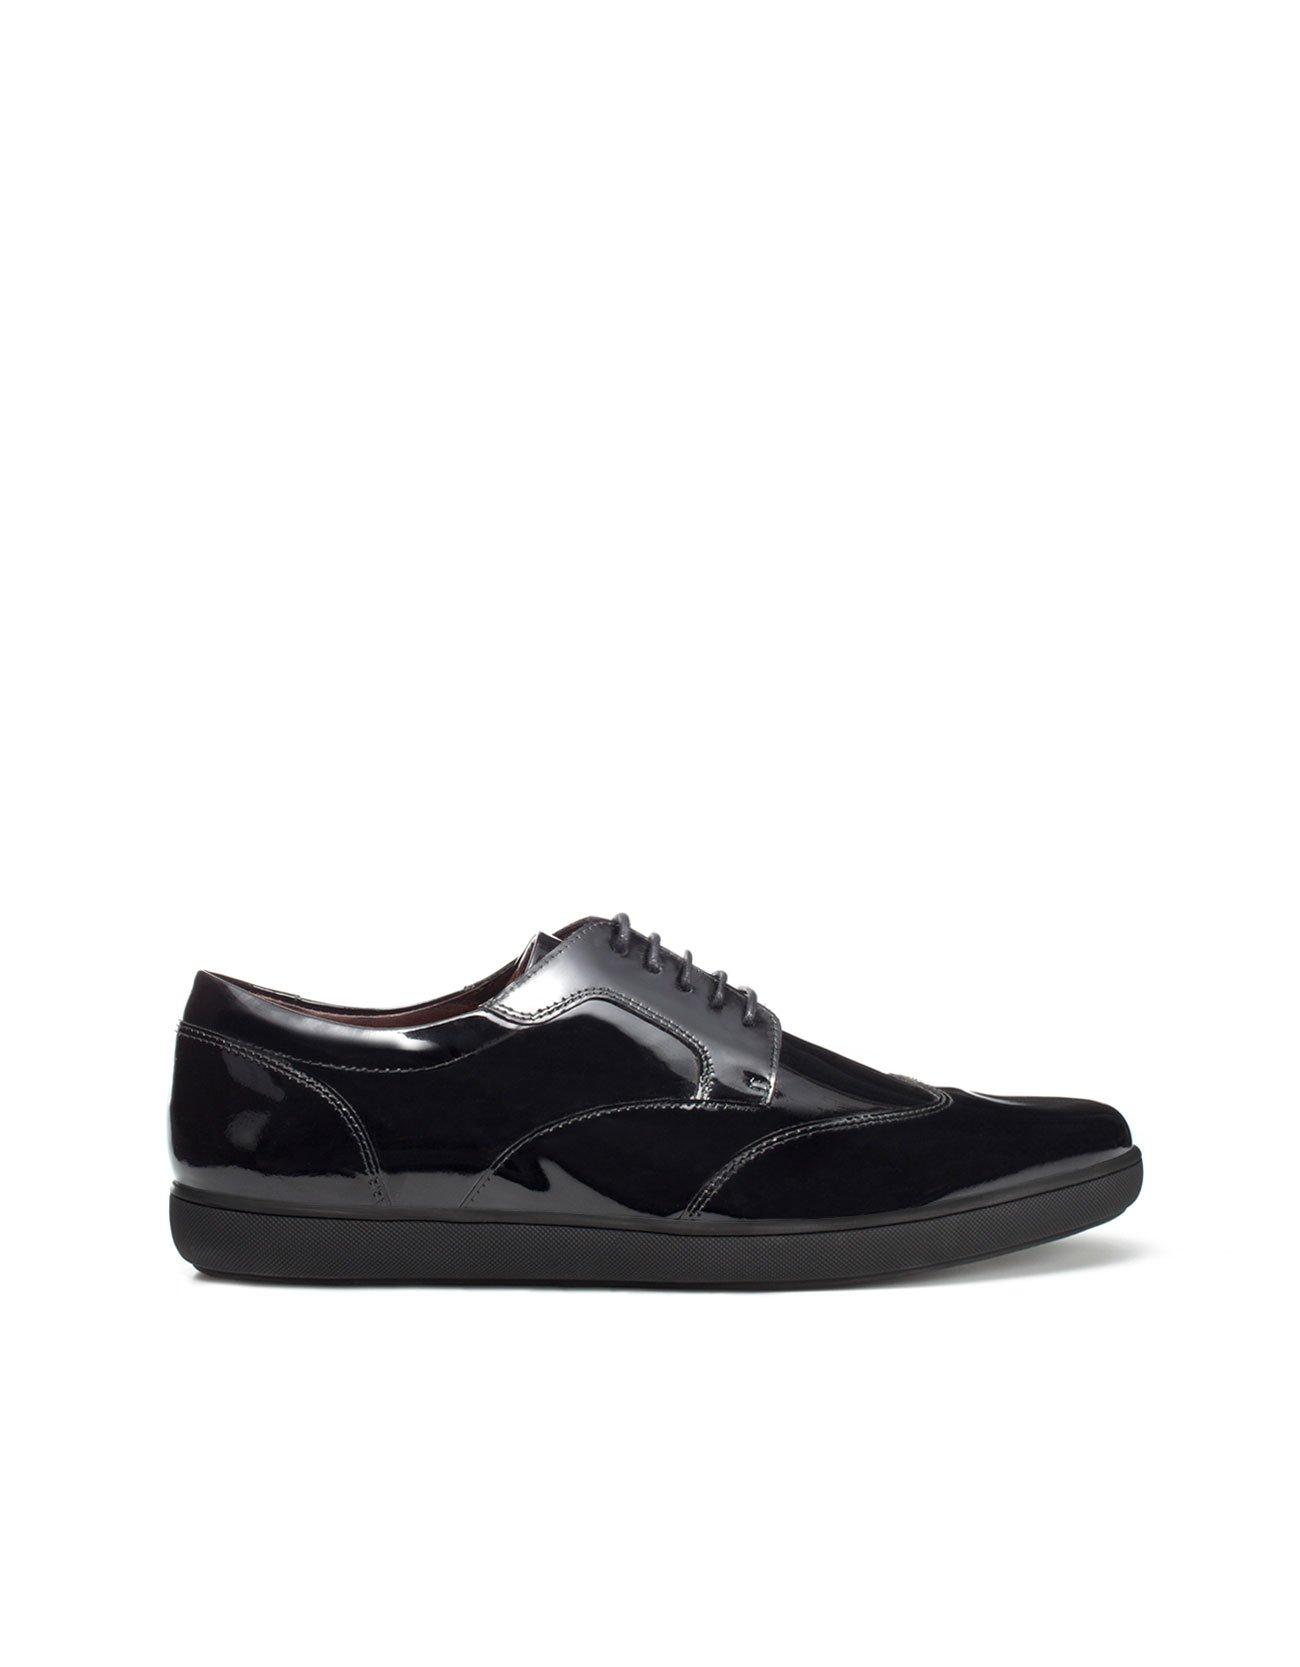 Wonderful Zara Shoes  Sold Zara NWT Silver Oxford Shoes Sz 1041